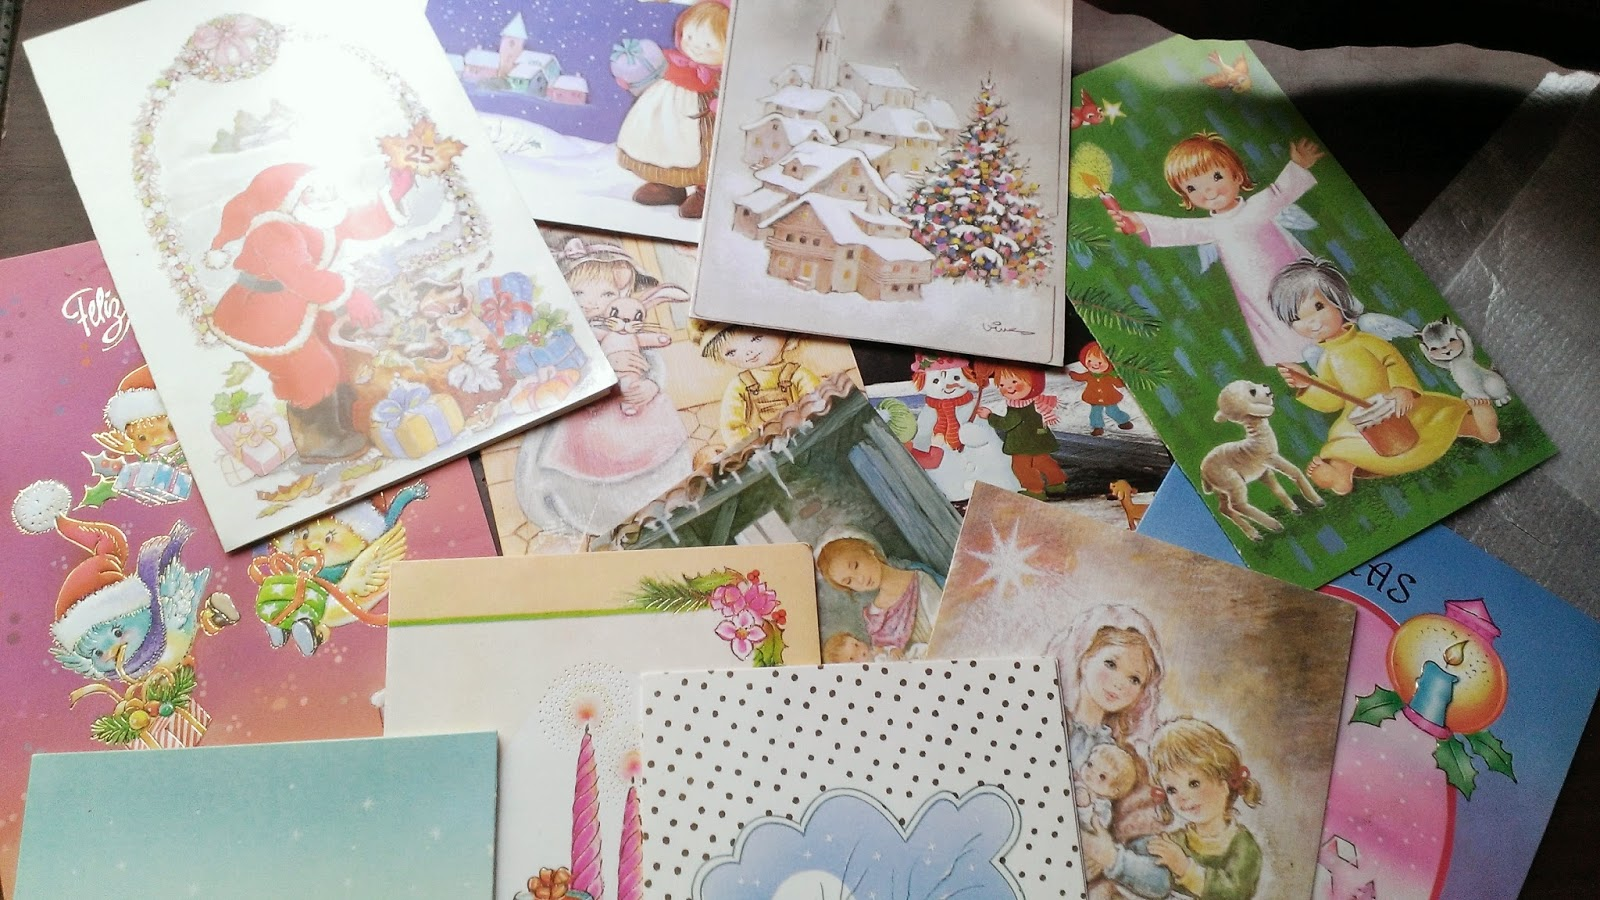 tarjetas navidad hacen feliz